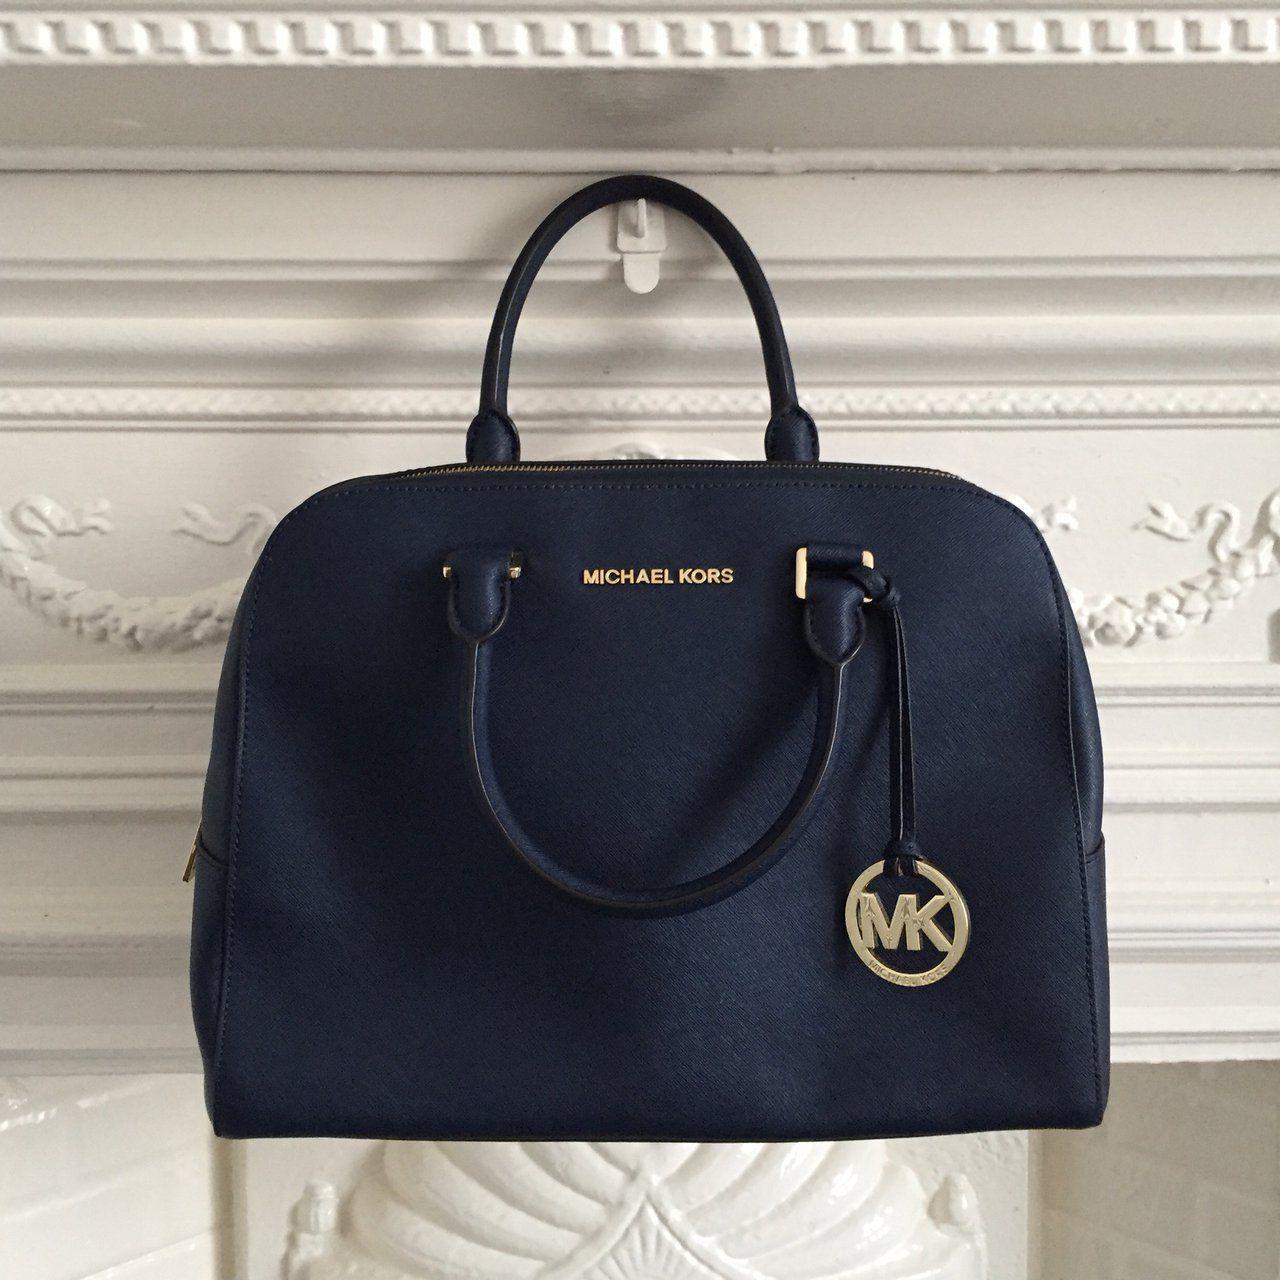 f1b8cc554e98 MICHAEL KORS original navy 100% leather handbag shoulder bag. Comes with a  detachable